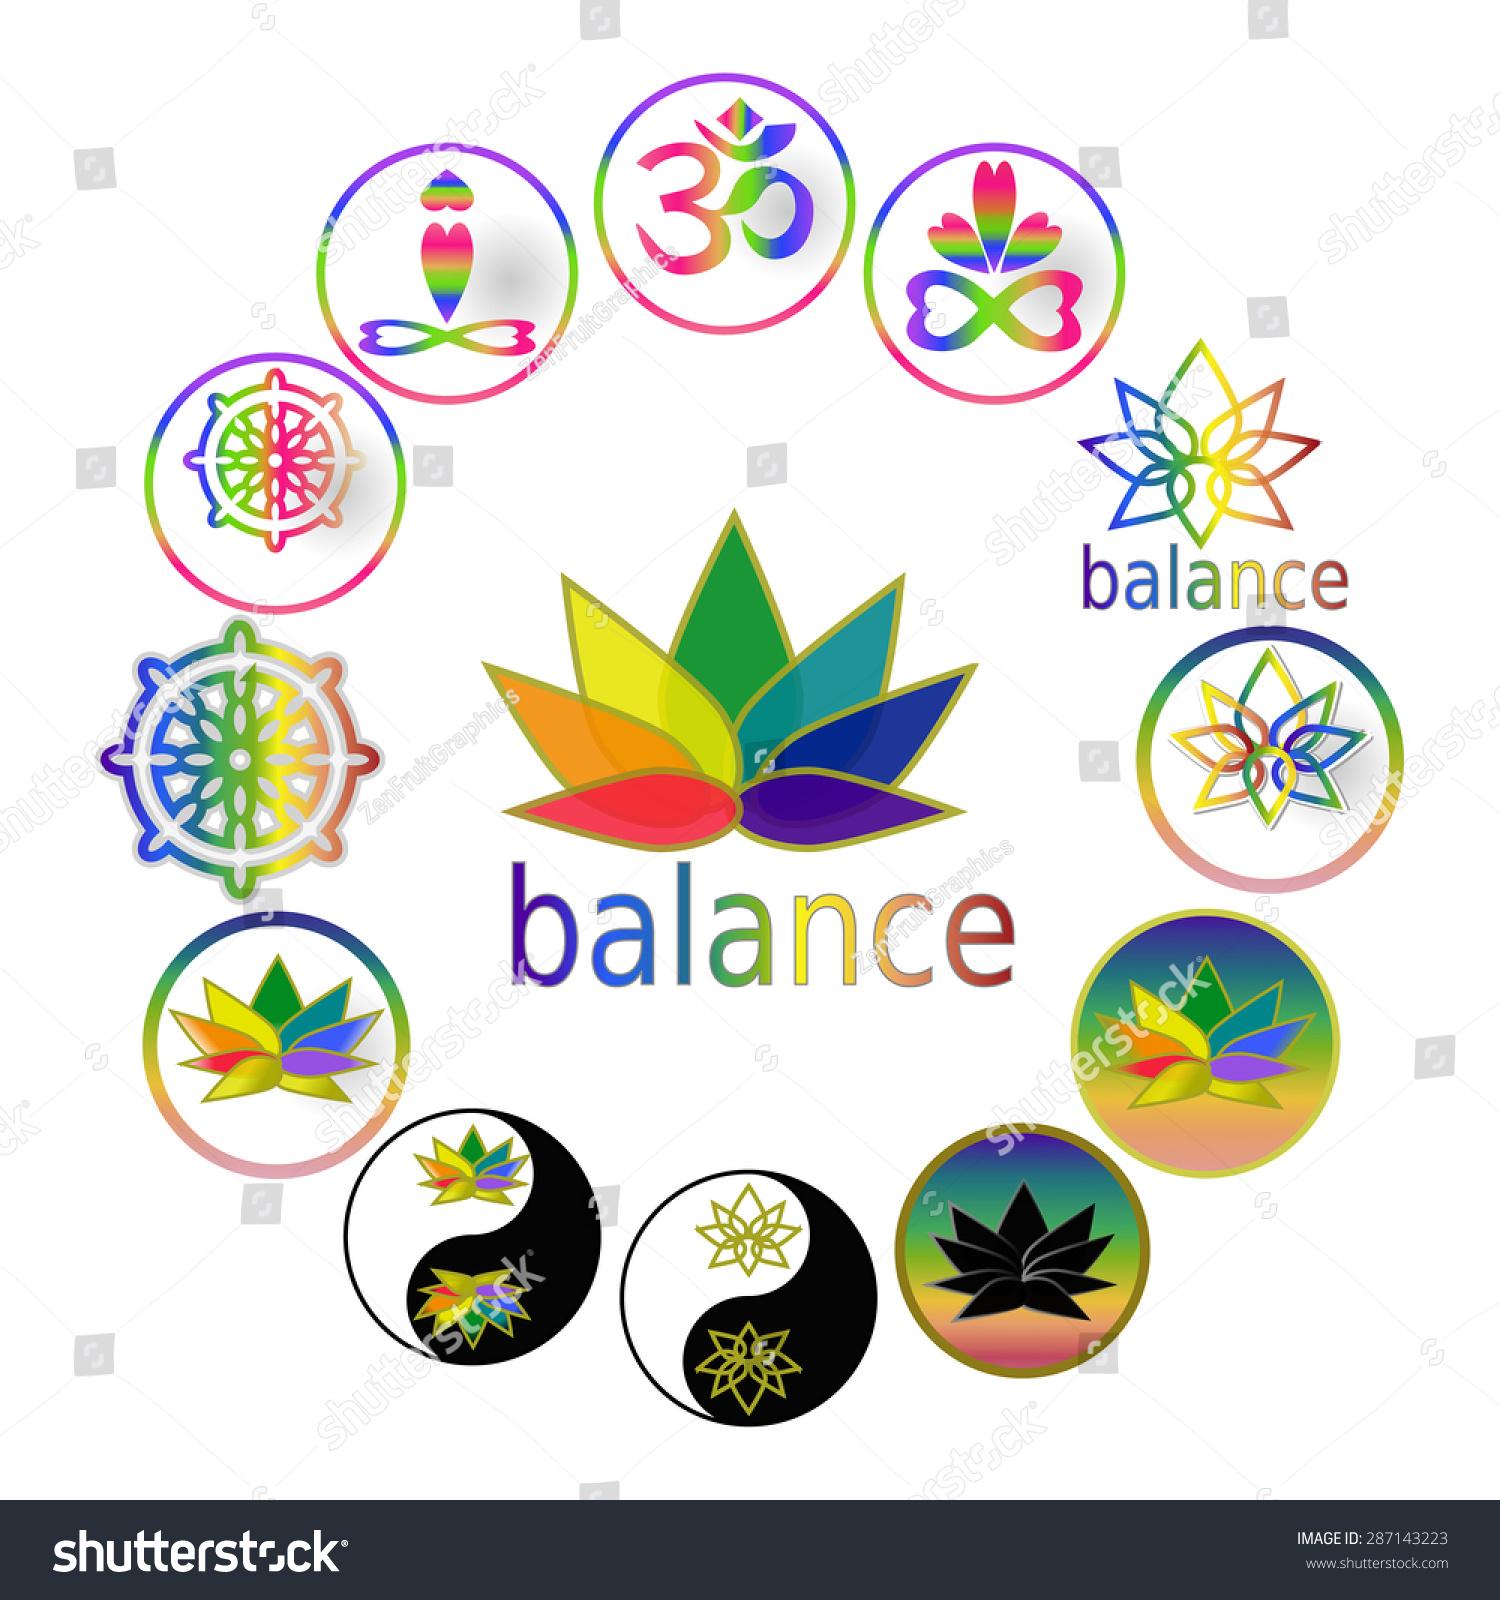 Zen Buddhist Symbols And Meanings: Spiritual Harmony Balance Icons Yoga Symbols Stock Vector